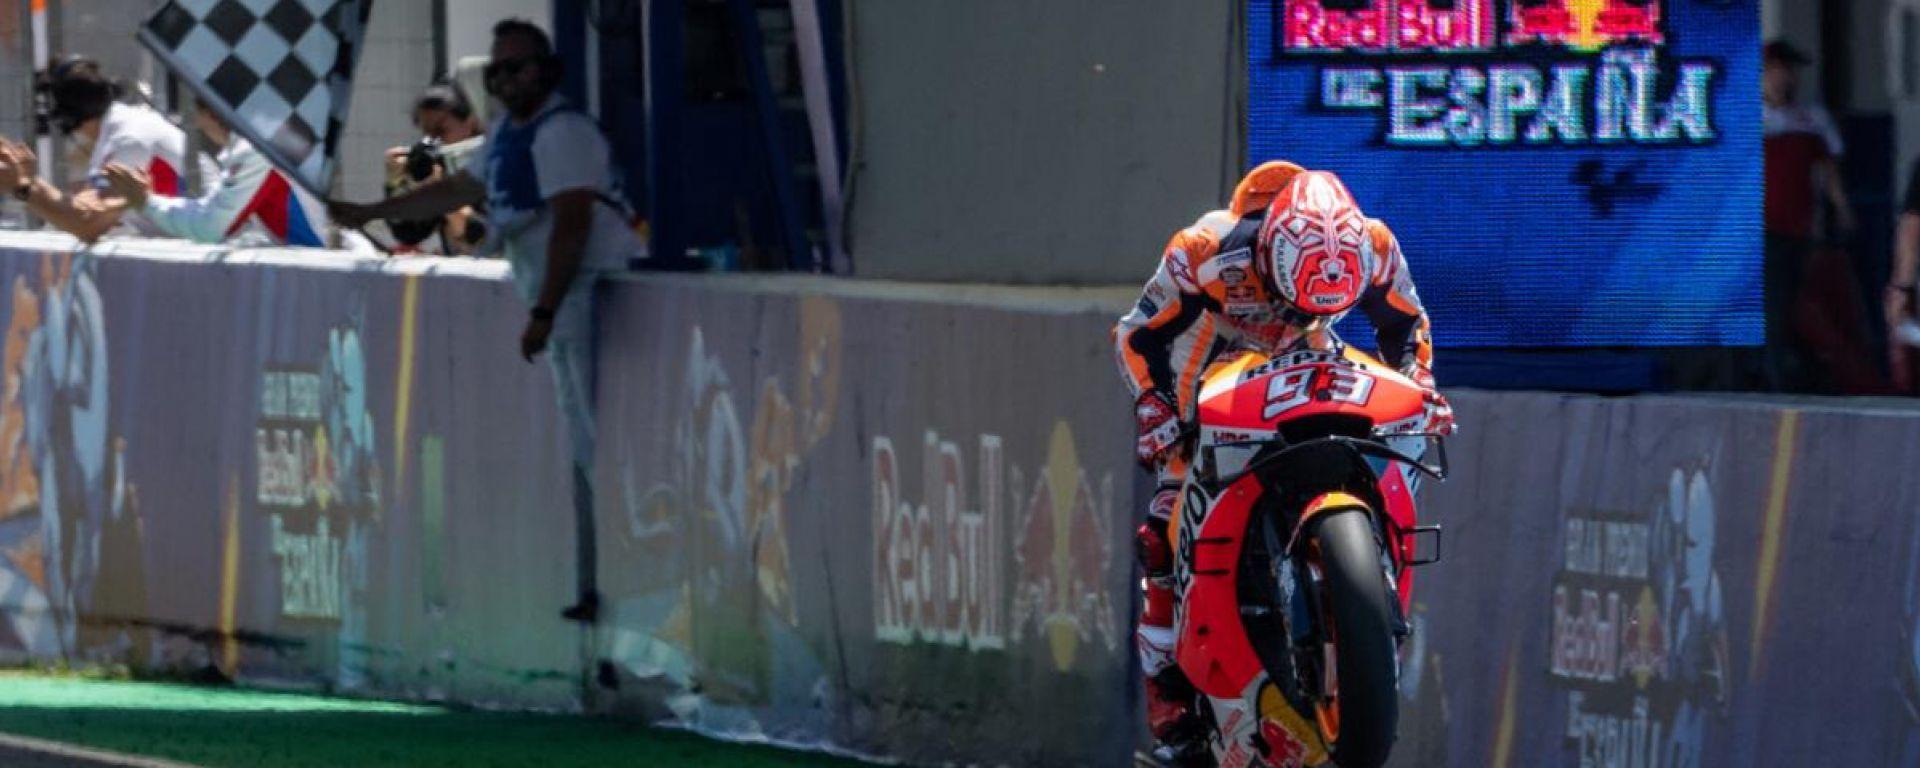 Marc Marquez (Honda) vince il GP di Spagna 2019 a Jerez